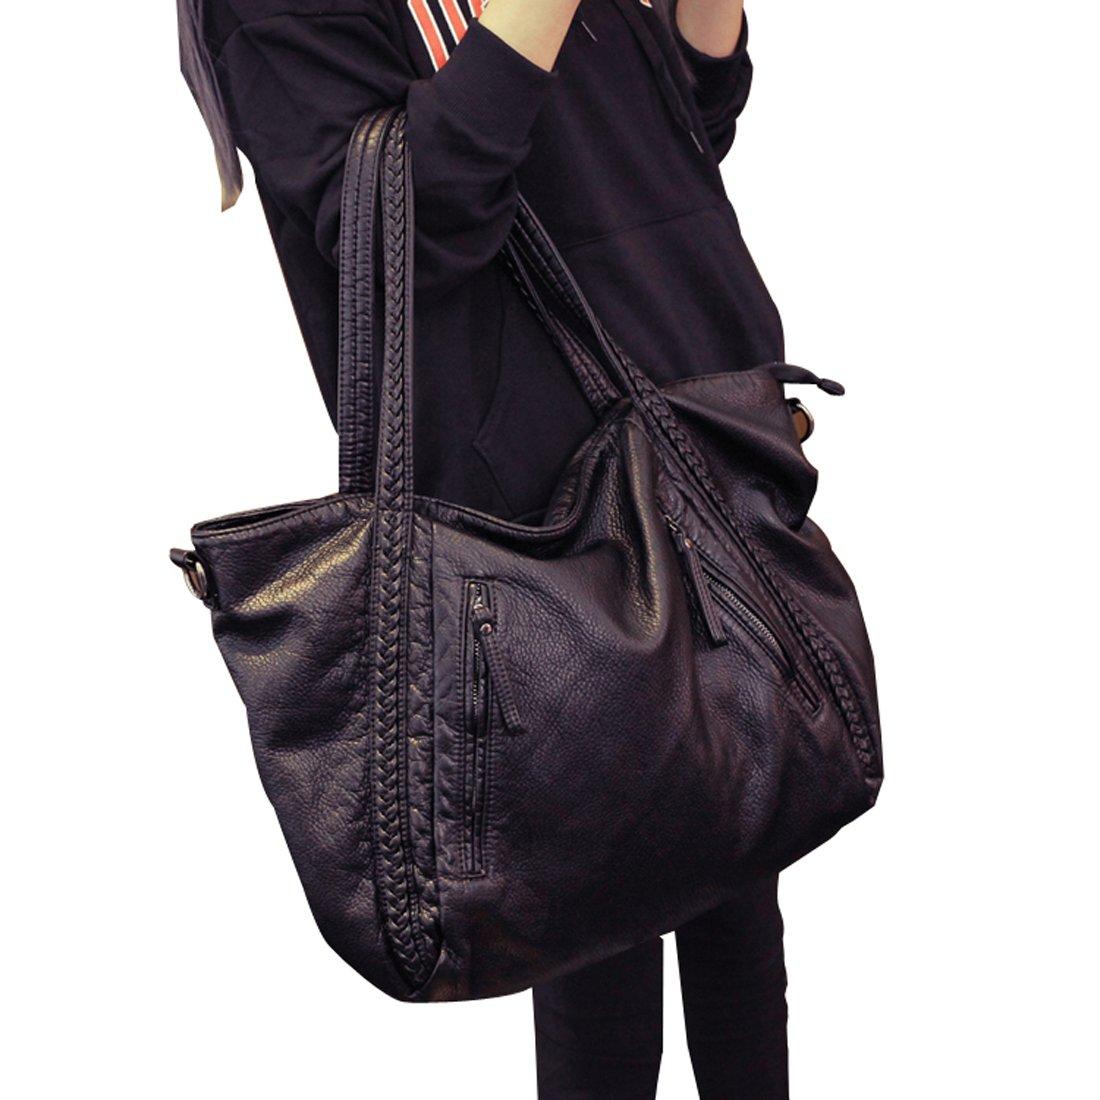 Big Capacity Fashion Women Handbags Soft Leather Lady Tote bag Woven Pattern Shoulder Bag(Big)